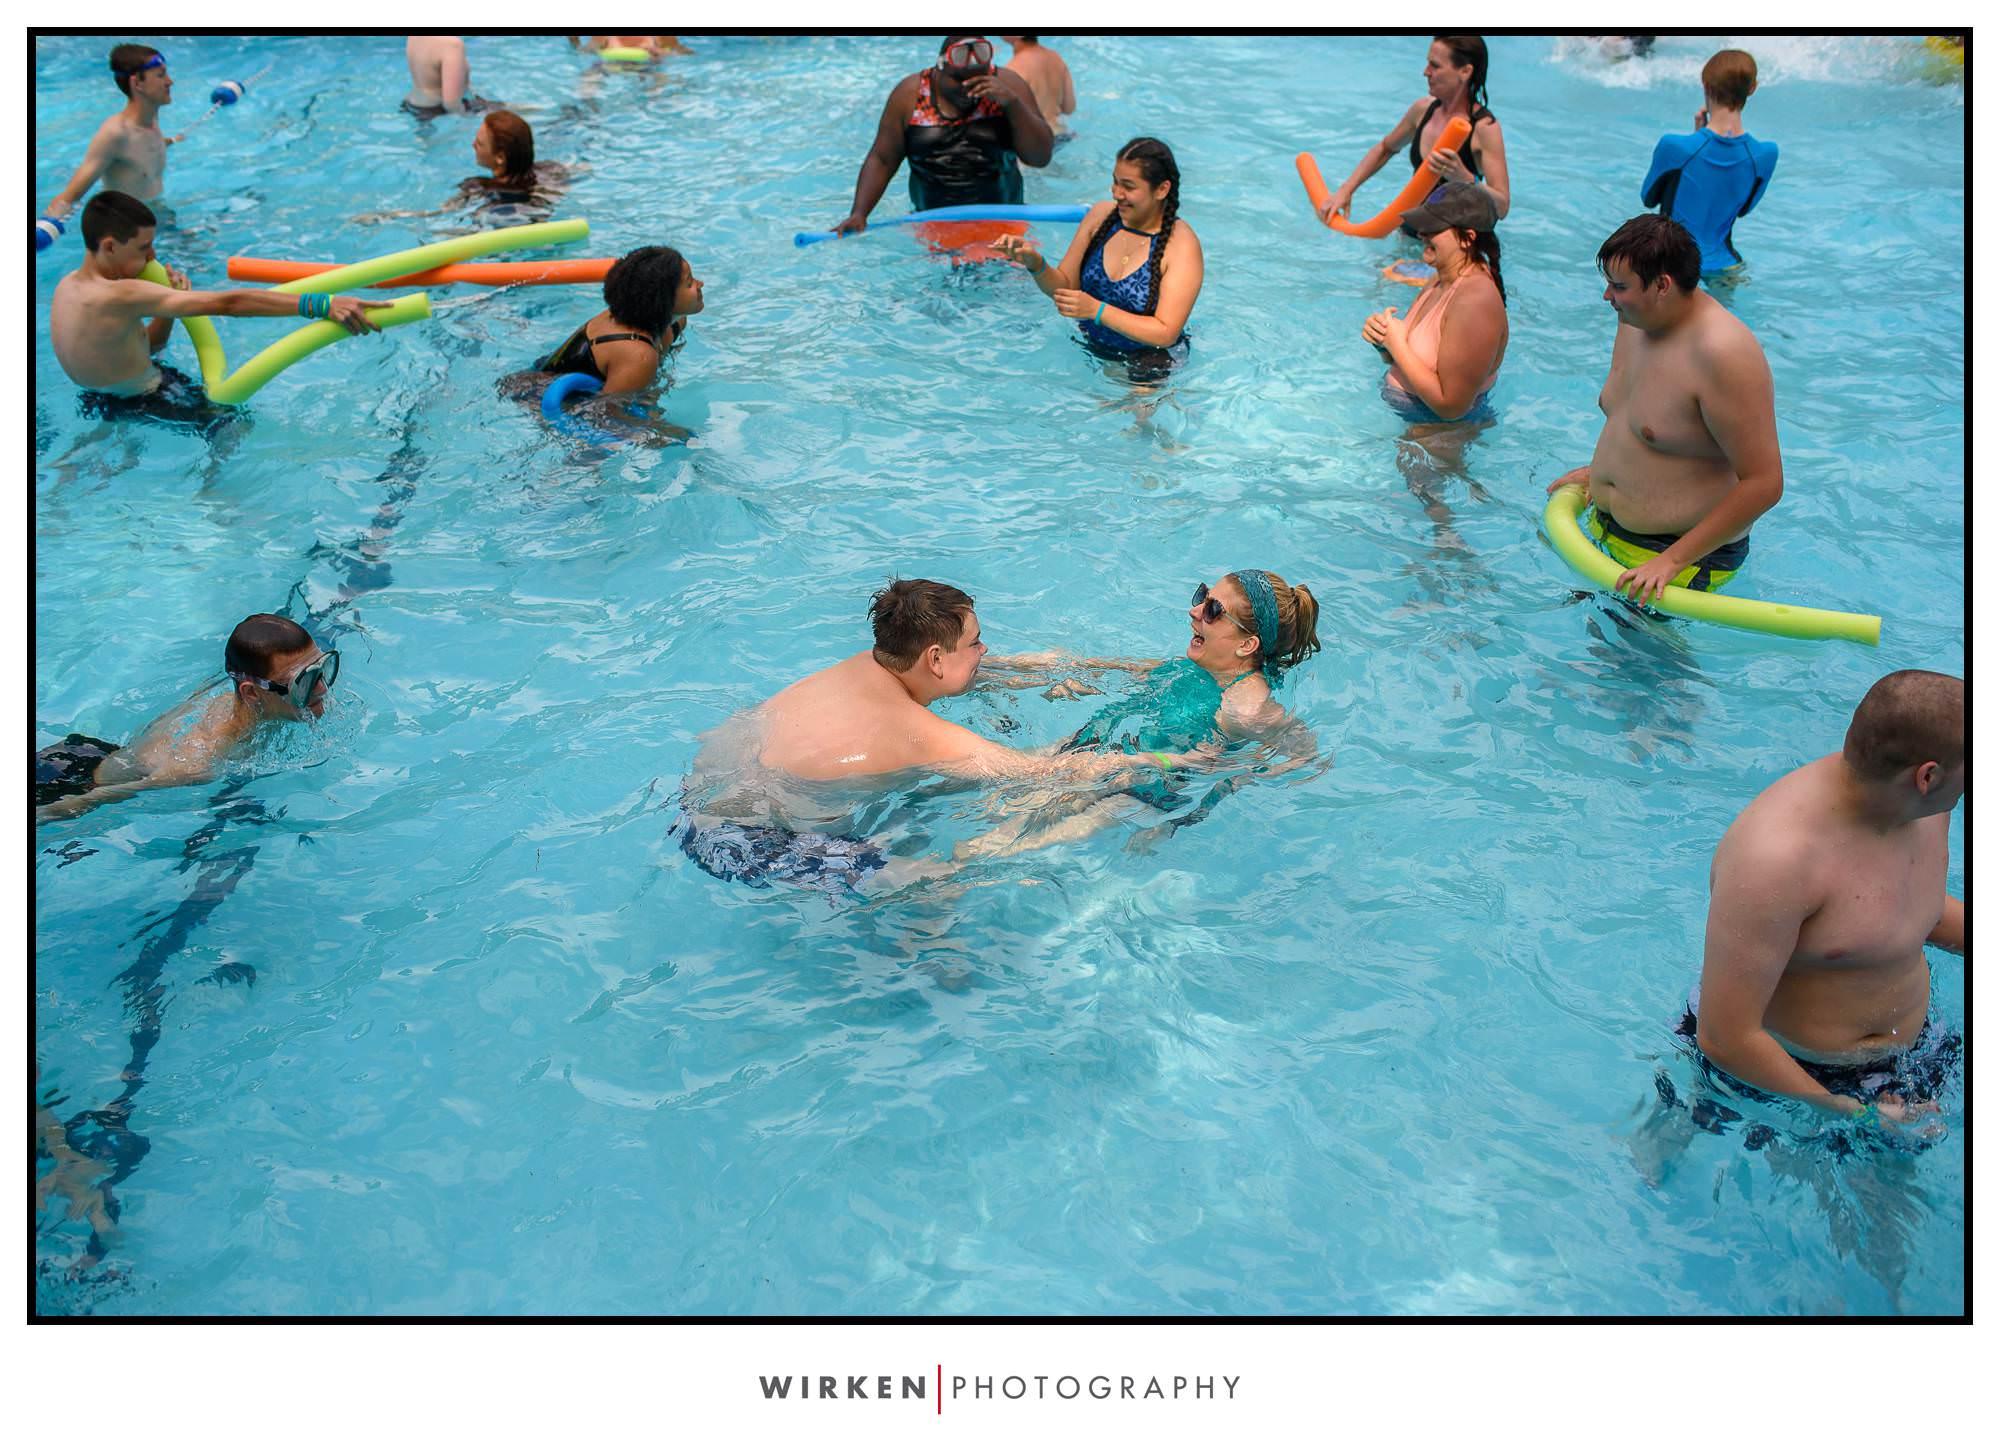 Camp Encourage autism spectrum disorder summer camp swimming pool